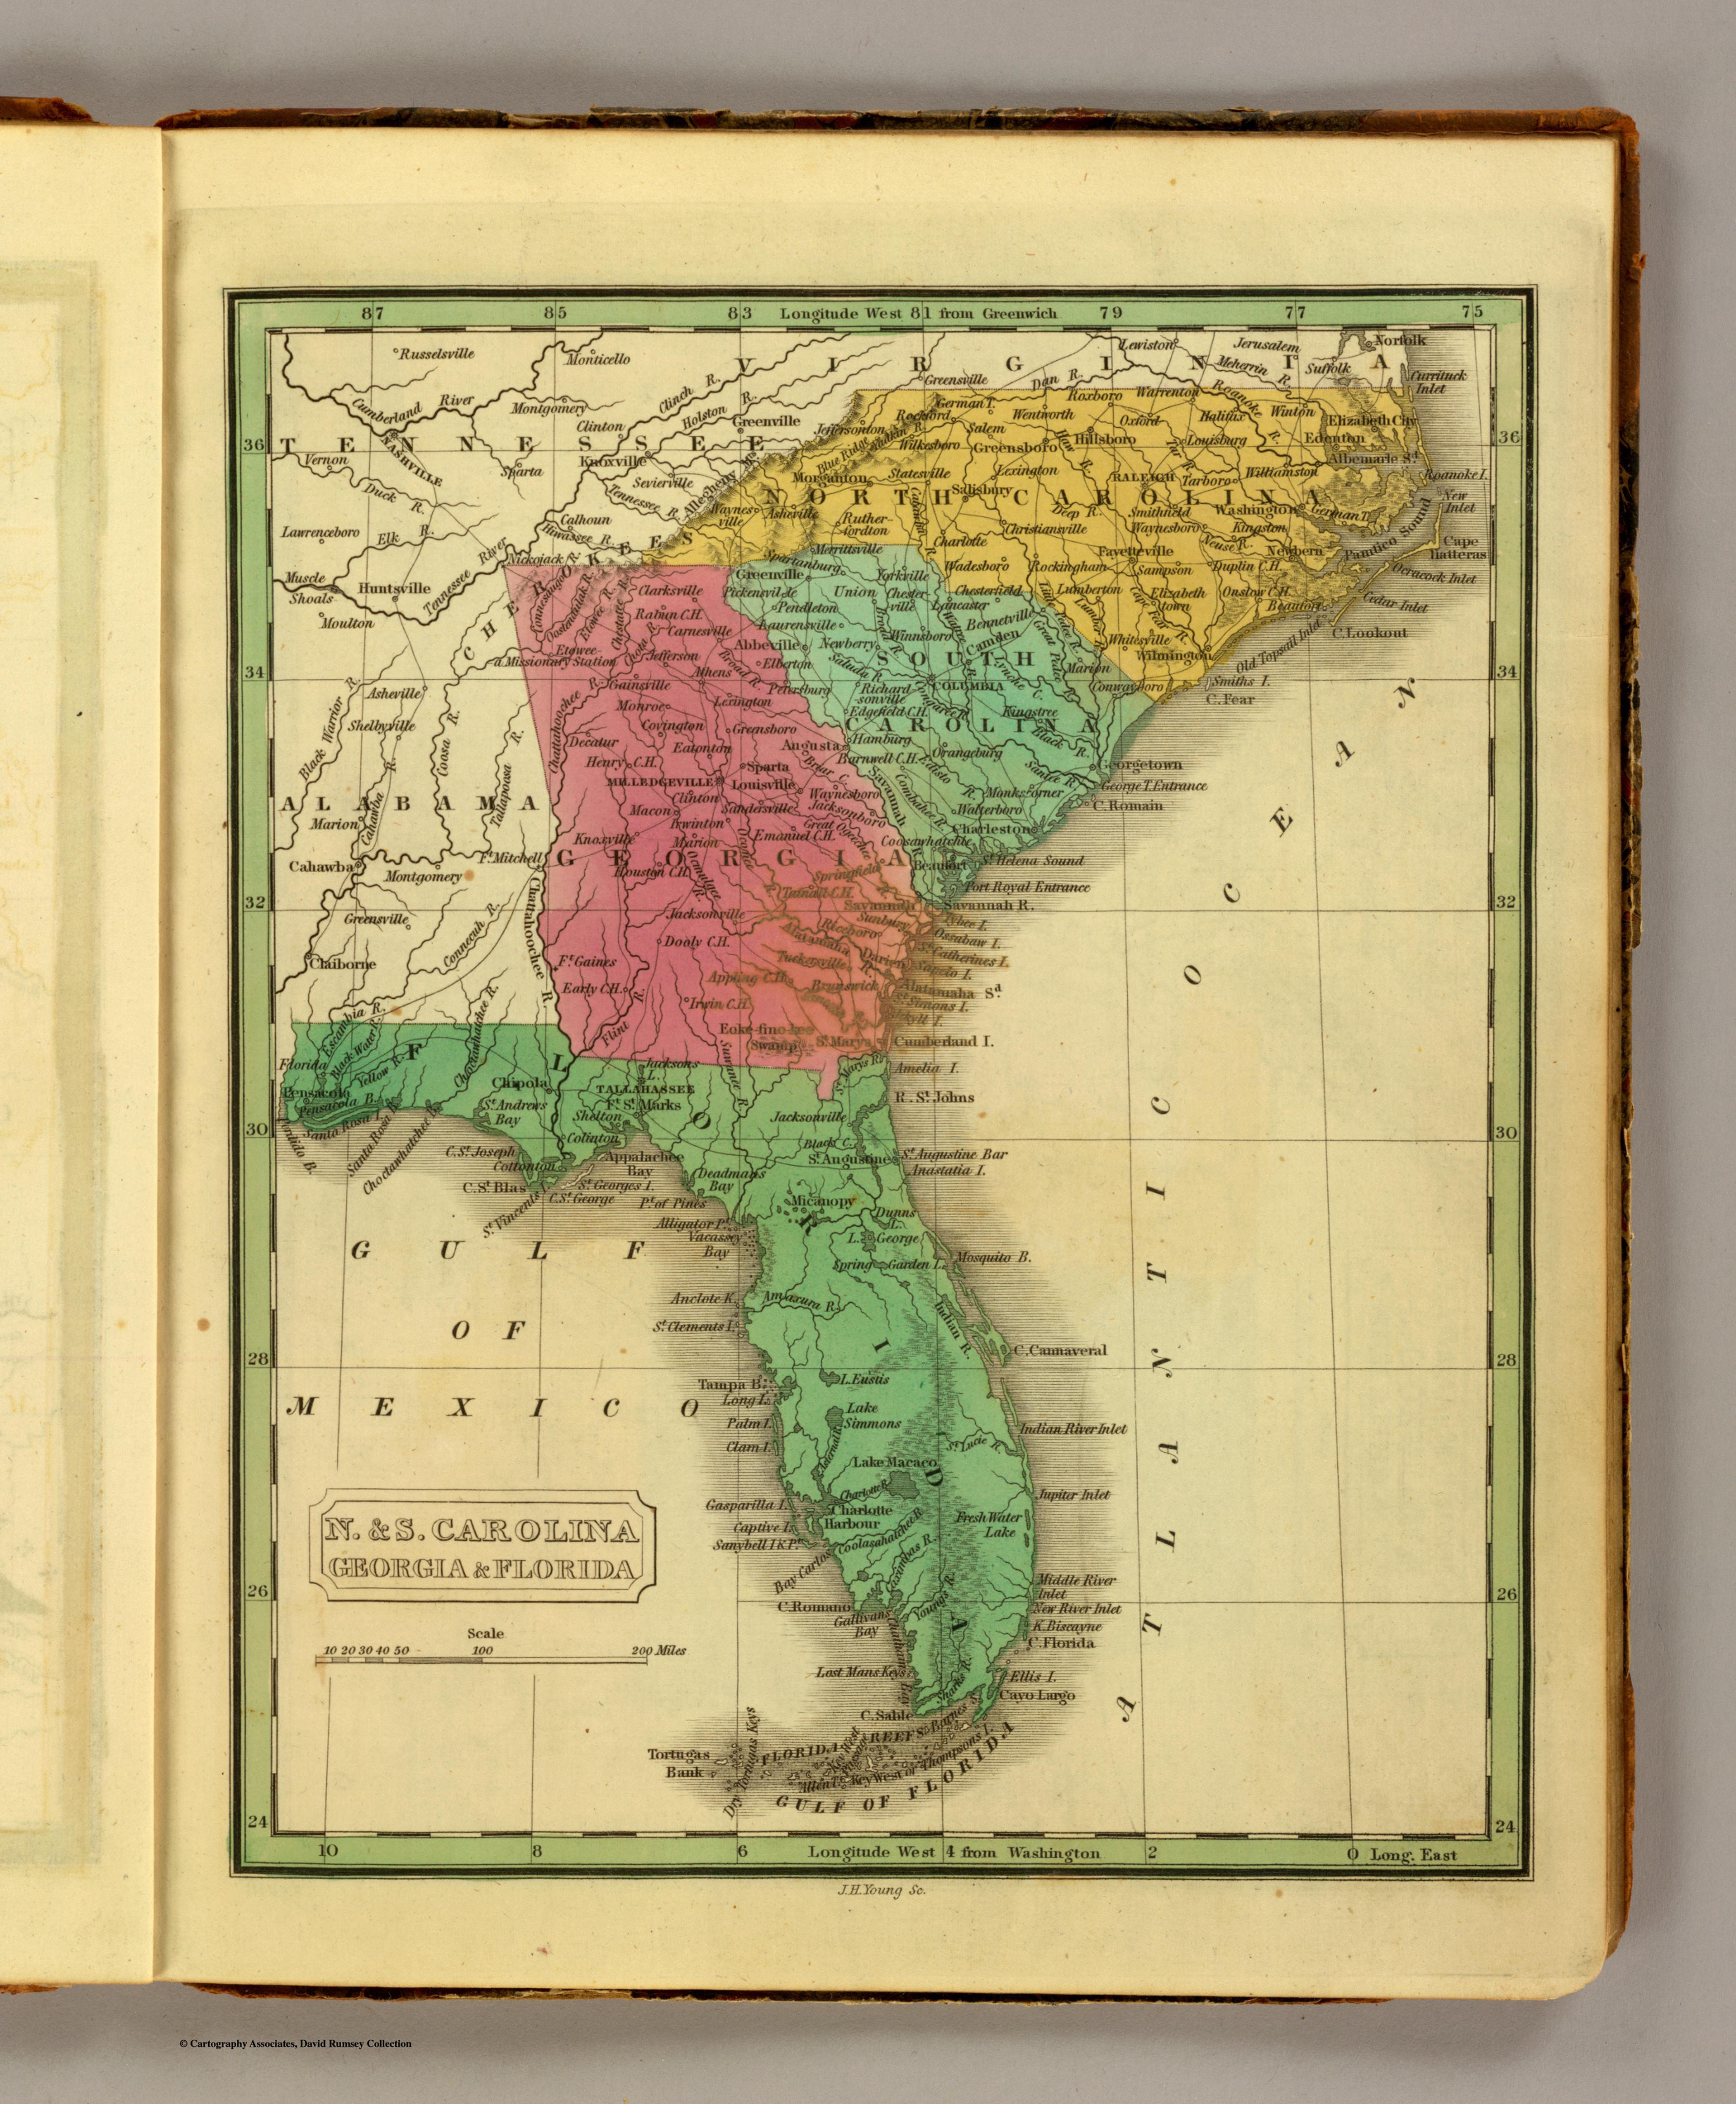 1855 GA MAP PEACH PICKENS PIERCE PIKE POLK PULASKI PUTNAM QUITMAN RABUN COUNTY